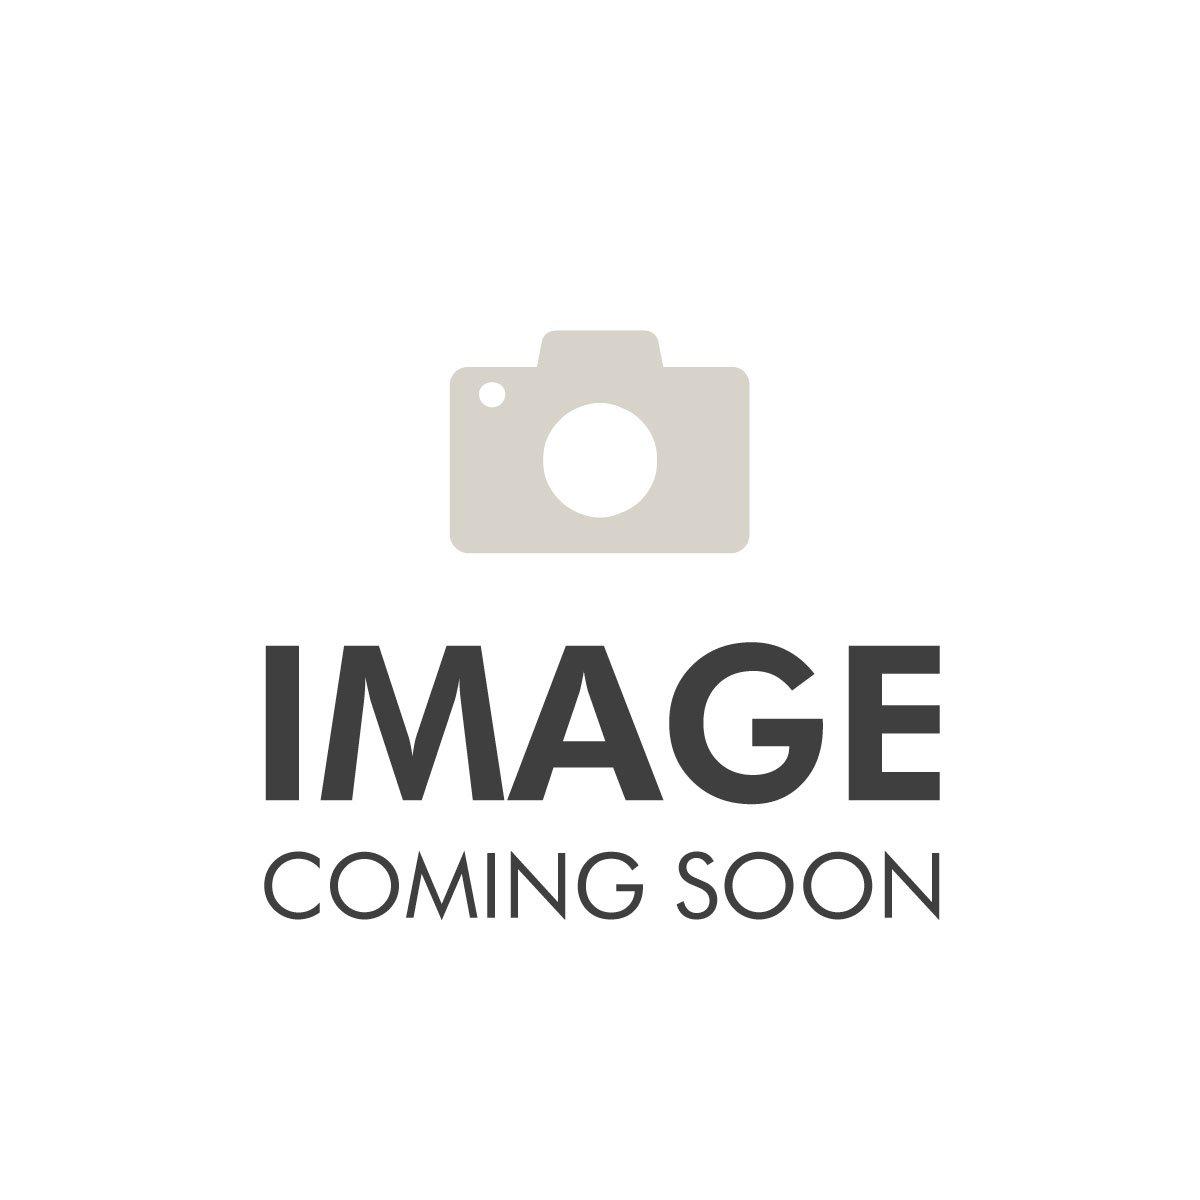 Lentheric Easy Bronze Face Bronzing Powder 15g - Sheer Copper